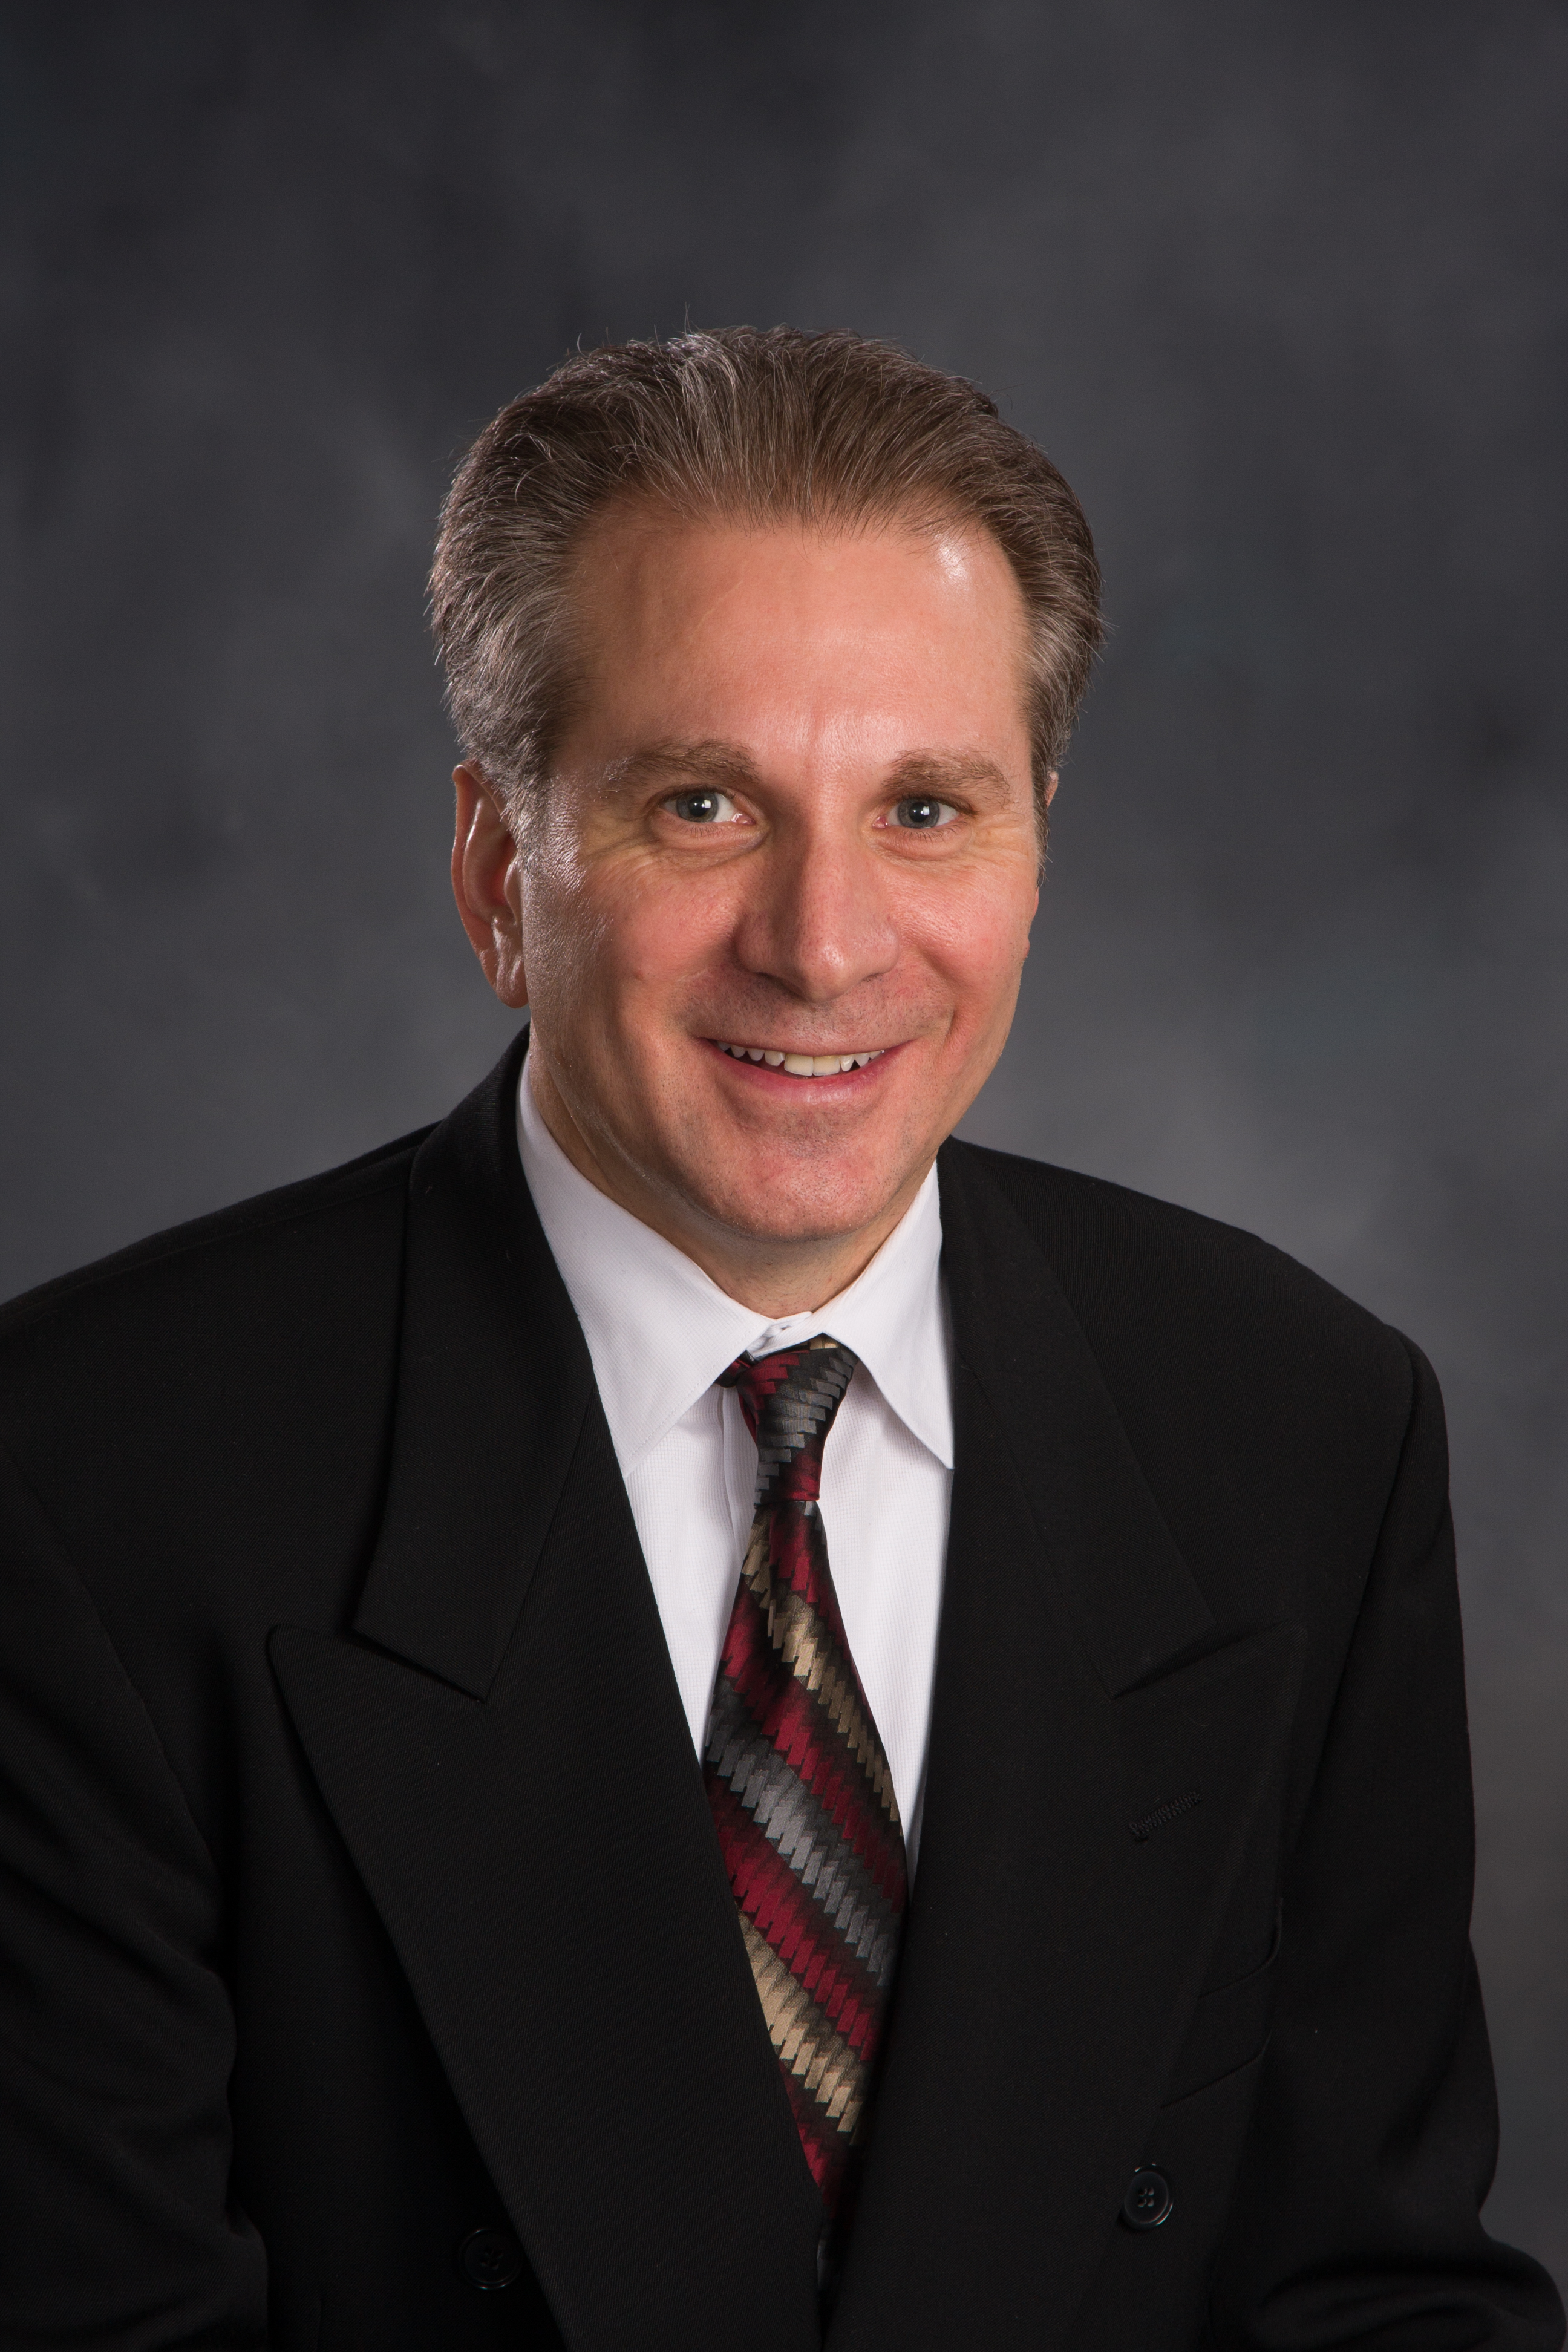 Robert Gullo, Broker/Salesperson